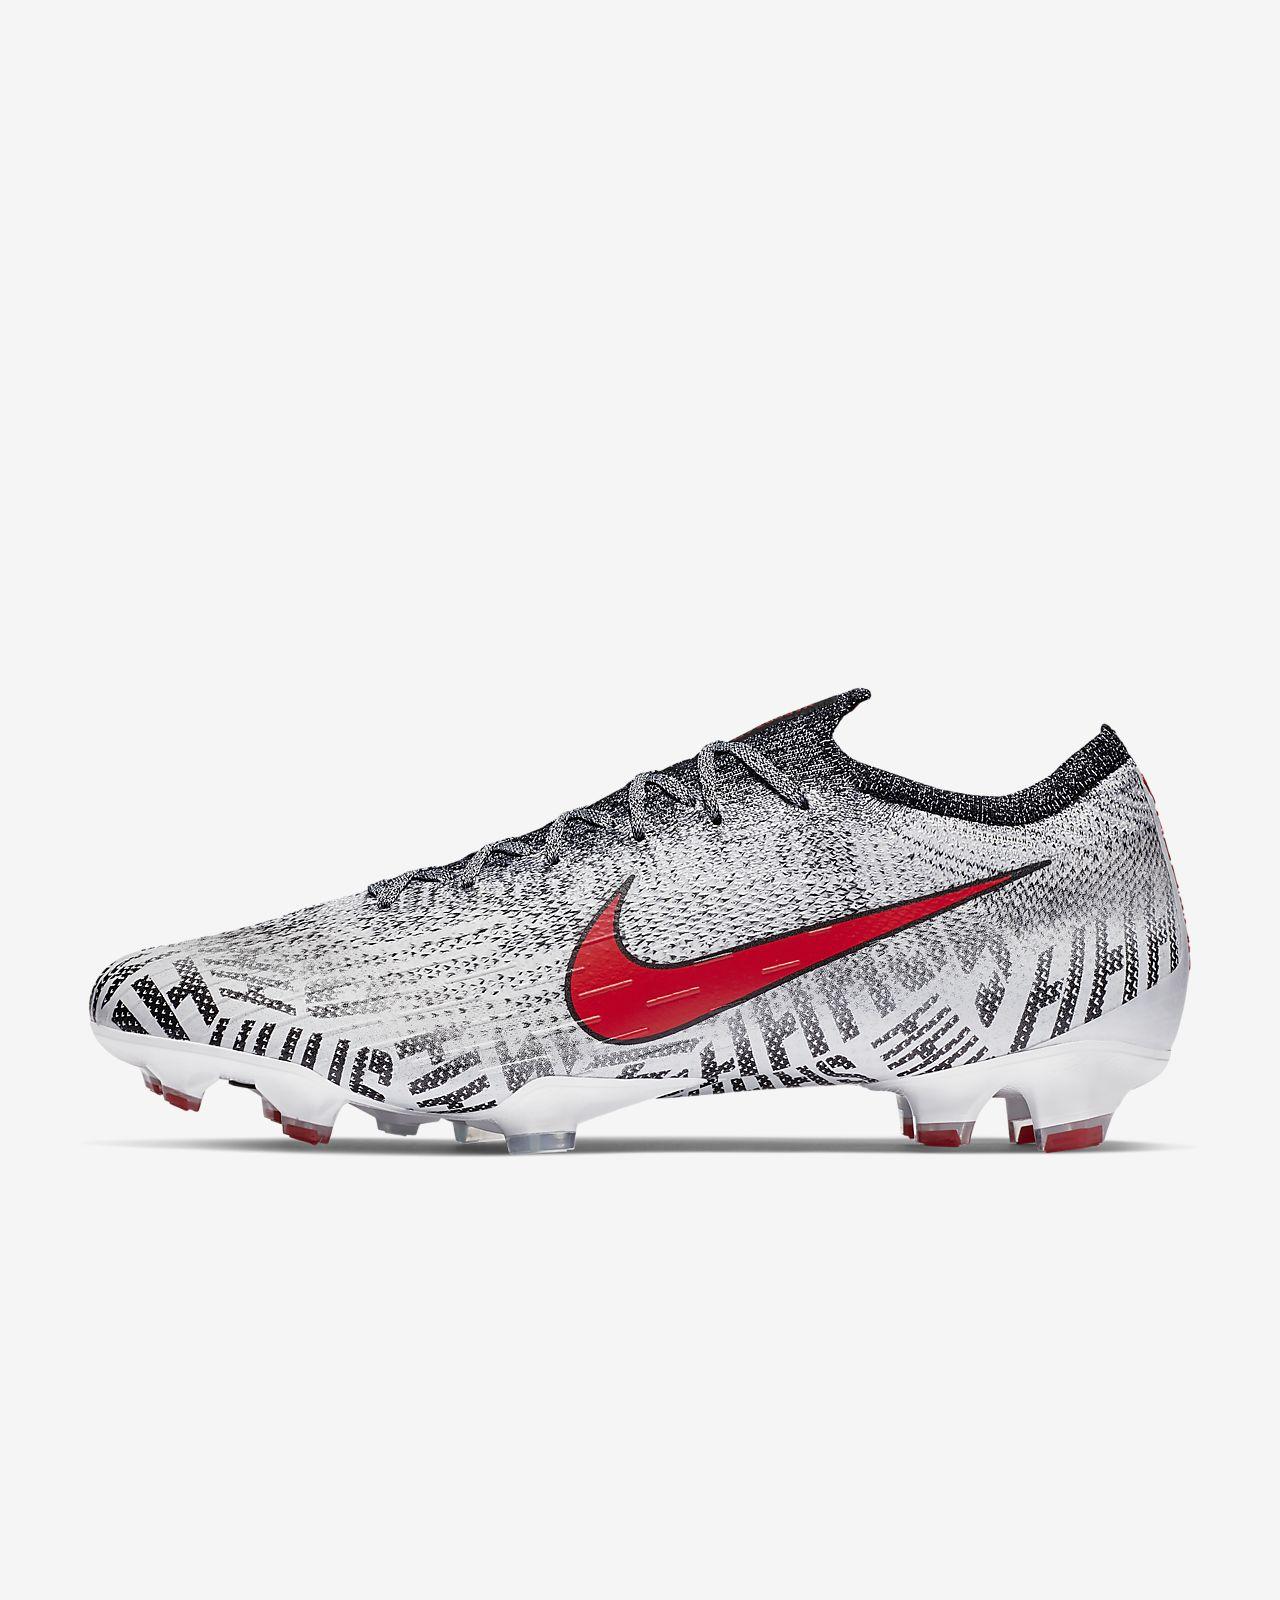 035afe3633 Chuteiras de futebol para terreno firme Nike Mercurial Vapor 360 Elite  Neymar Jr